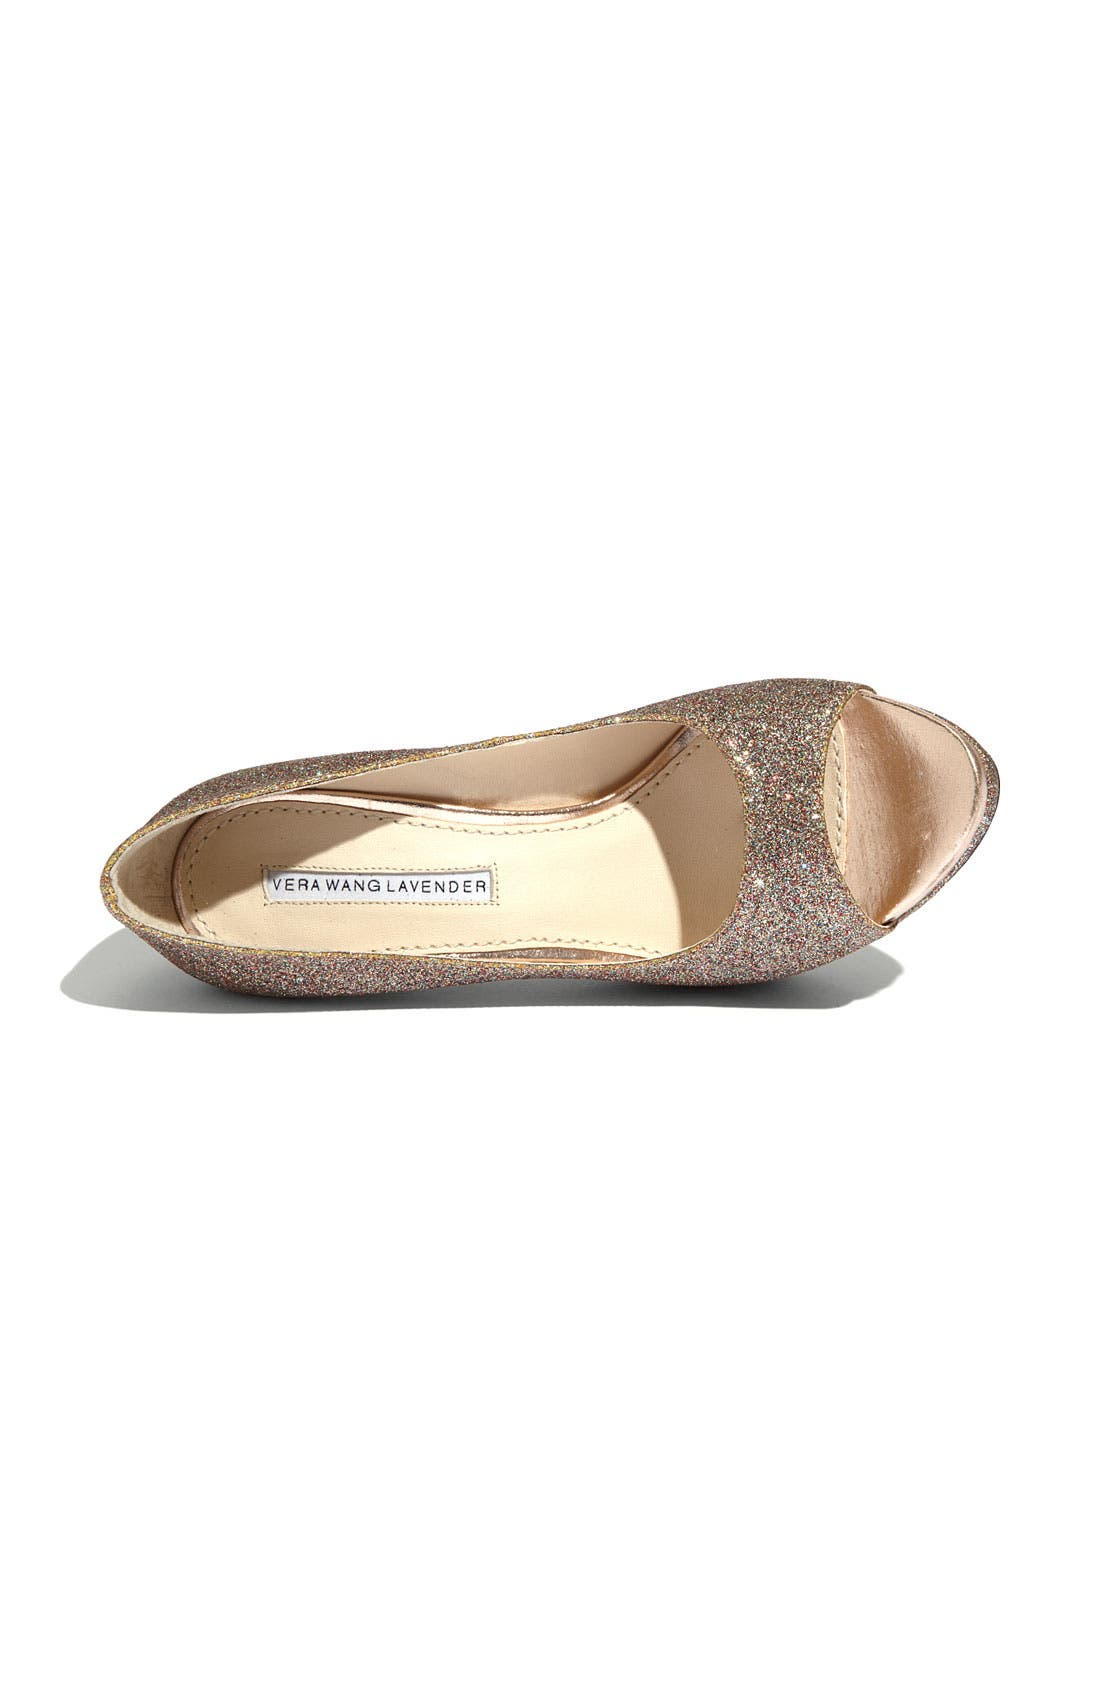 Footwear 'Selima' Peep Toe Pump,                             Alternate thumbnail 11, color,